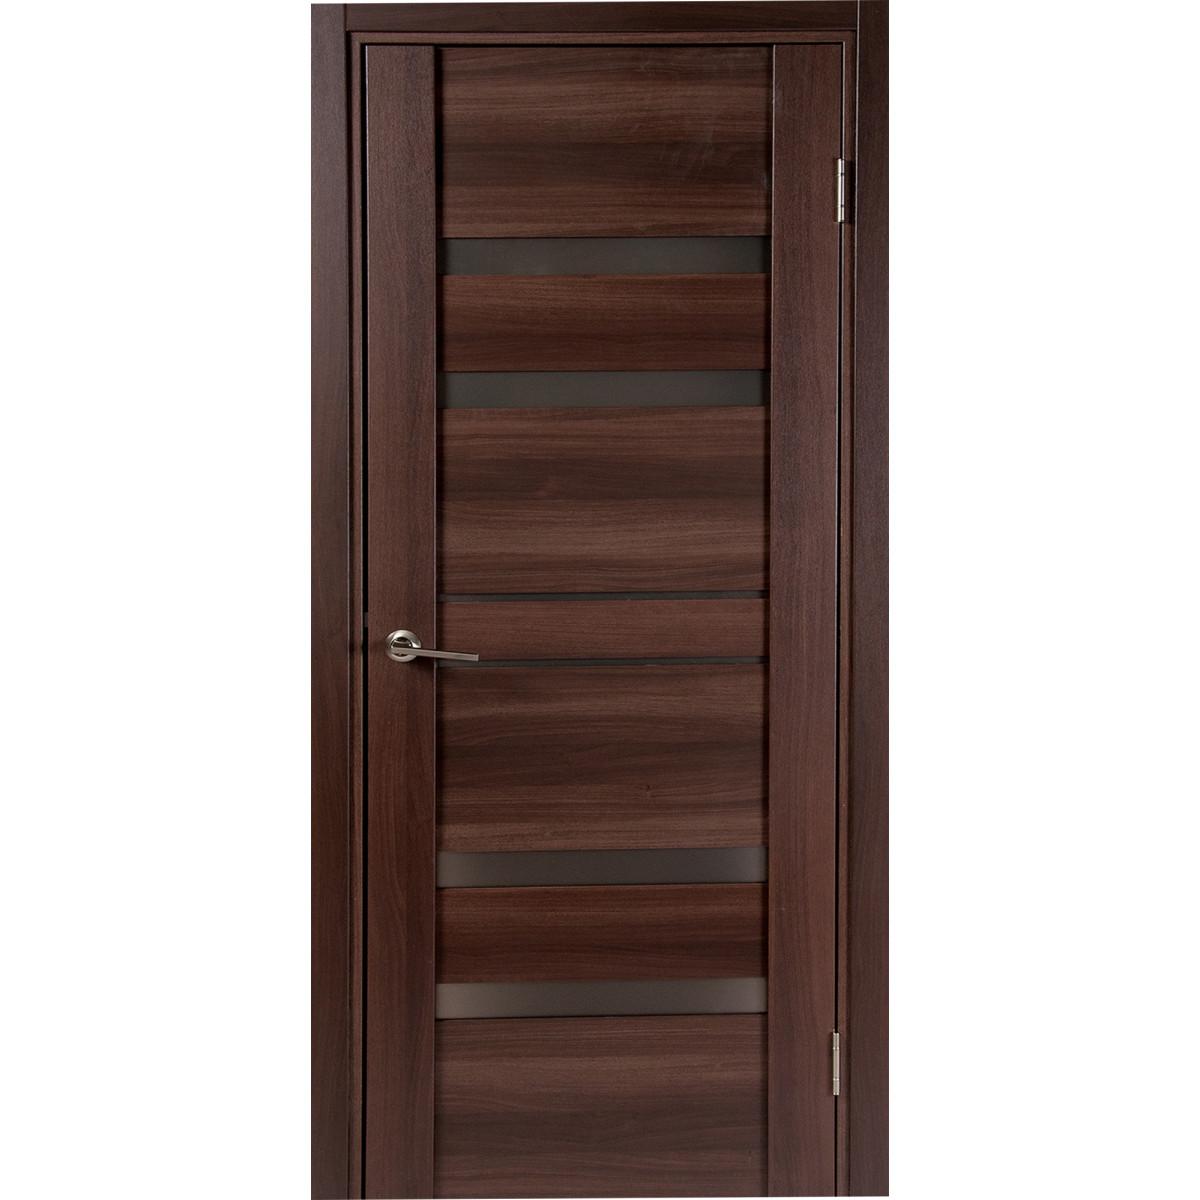 Дверь Межкомнатная Глухая Artens Велдон 90x200 Цвет Мокко/Бронза Без Фурнитуры